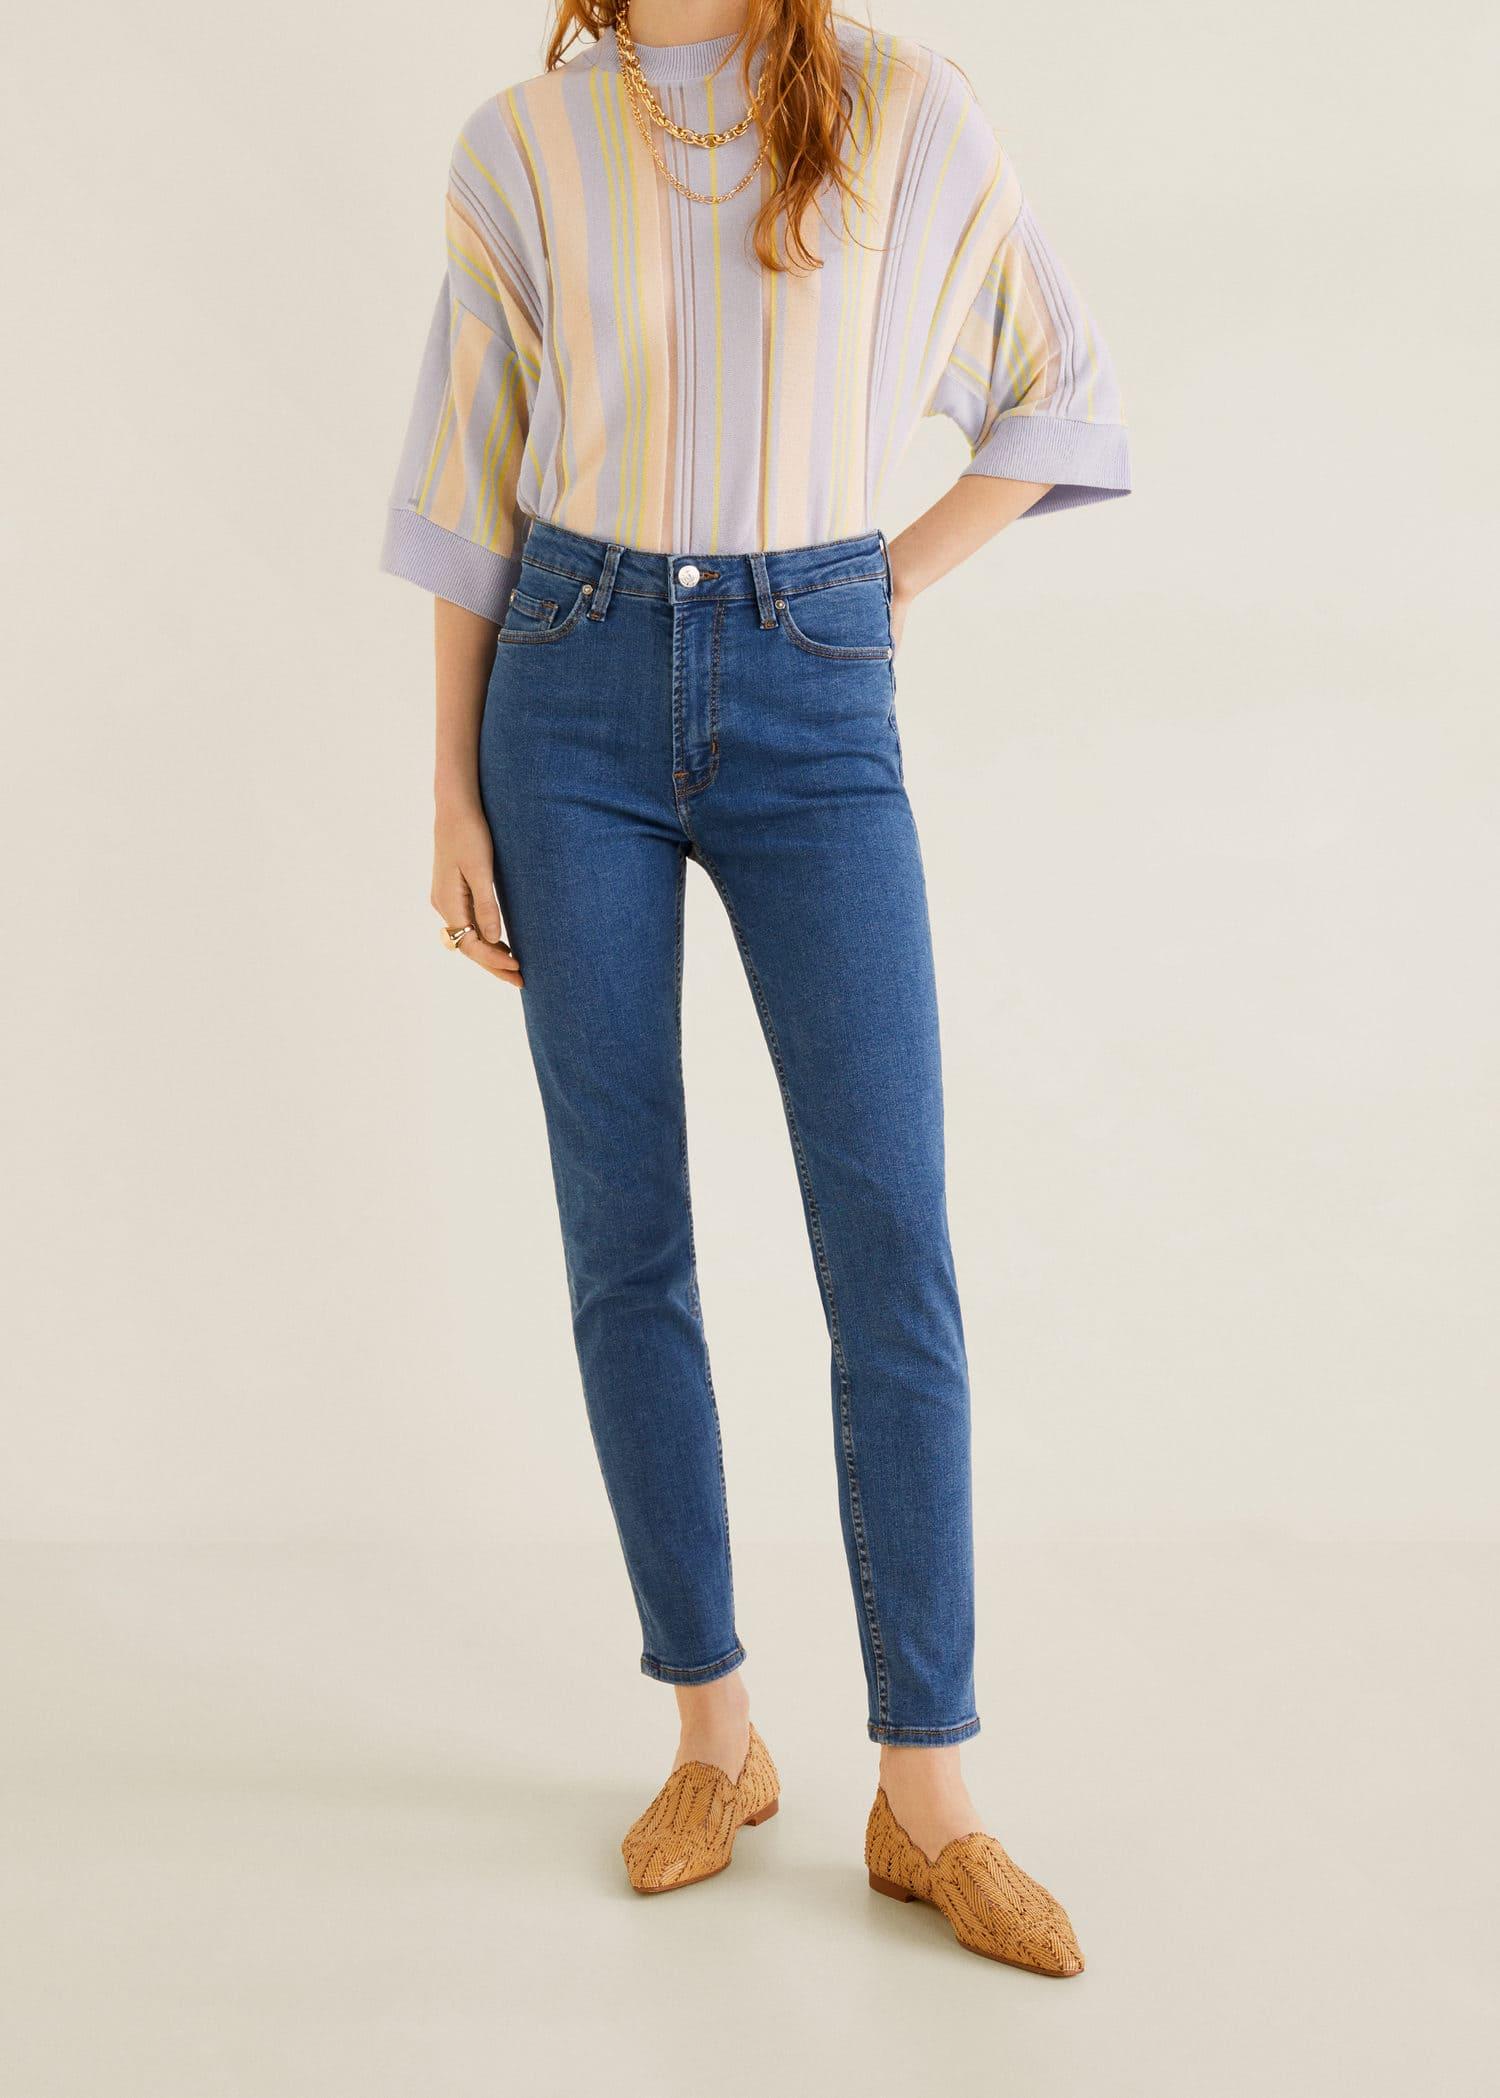 Mango Noa Sky Blue Skinny Jeans Women/'s High Waist Jeans Size 6